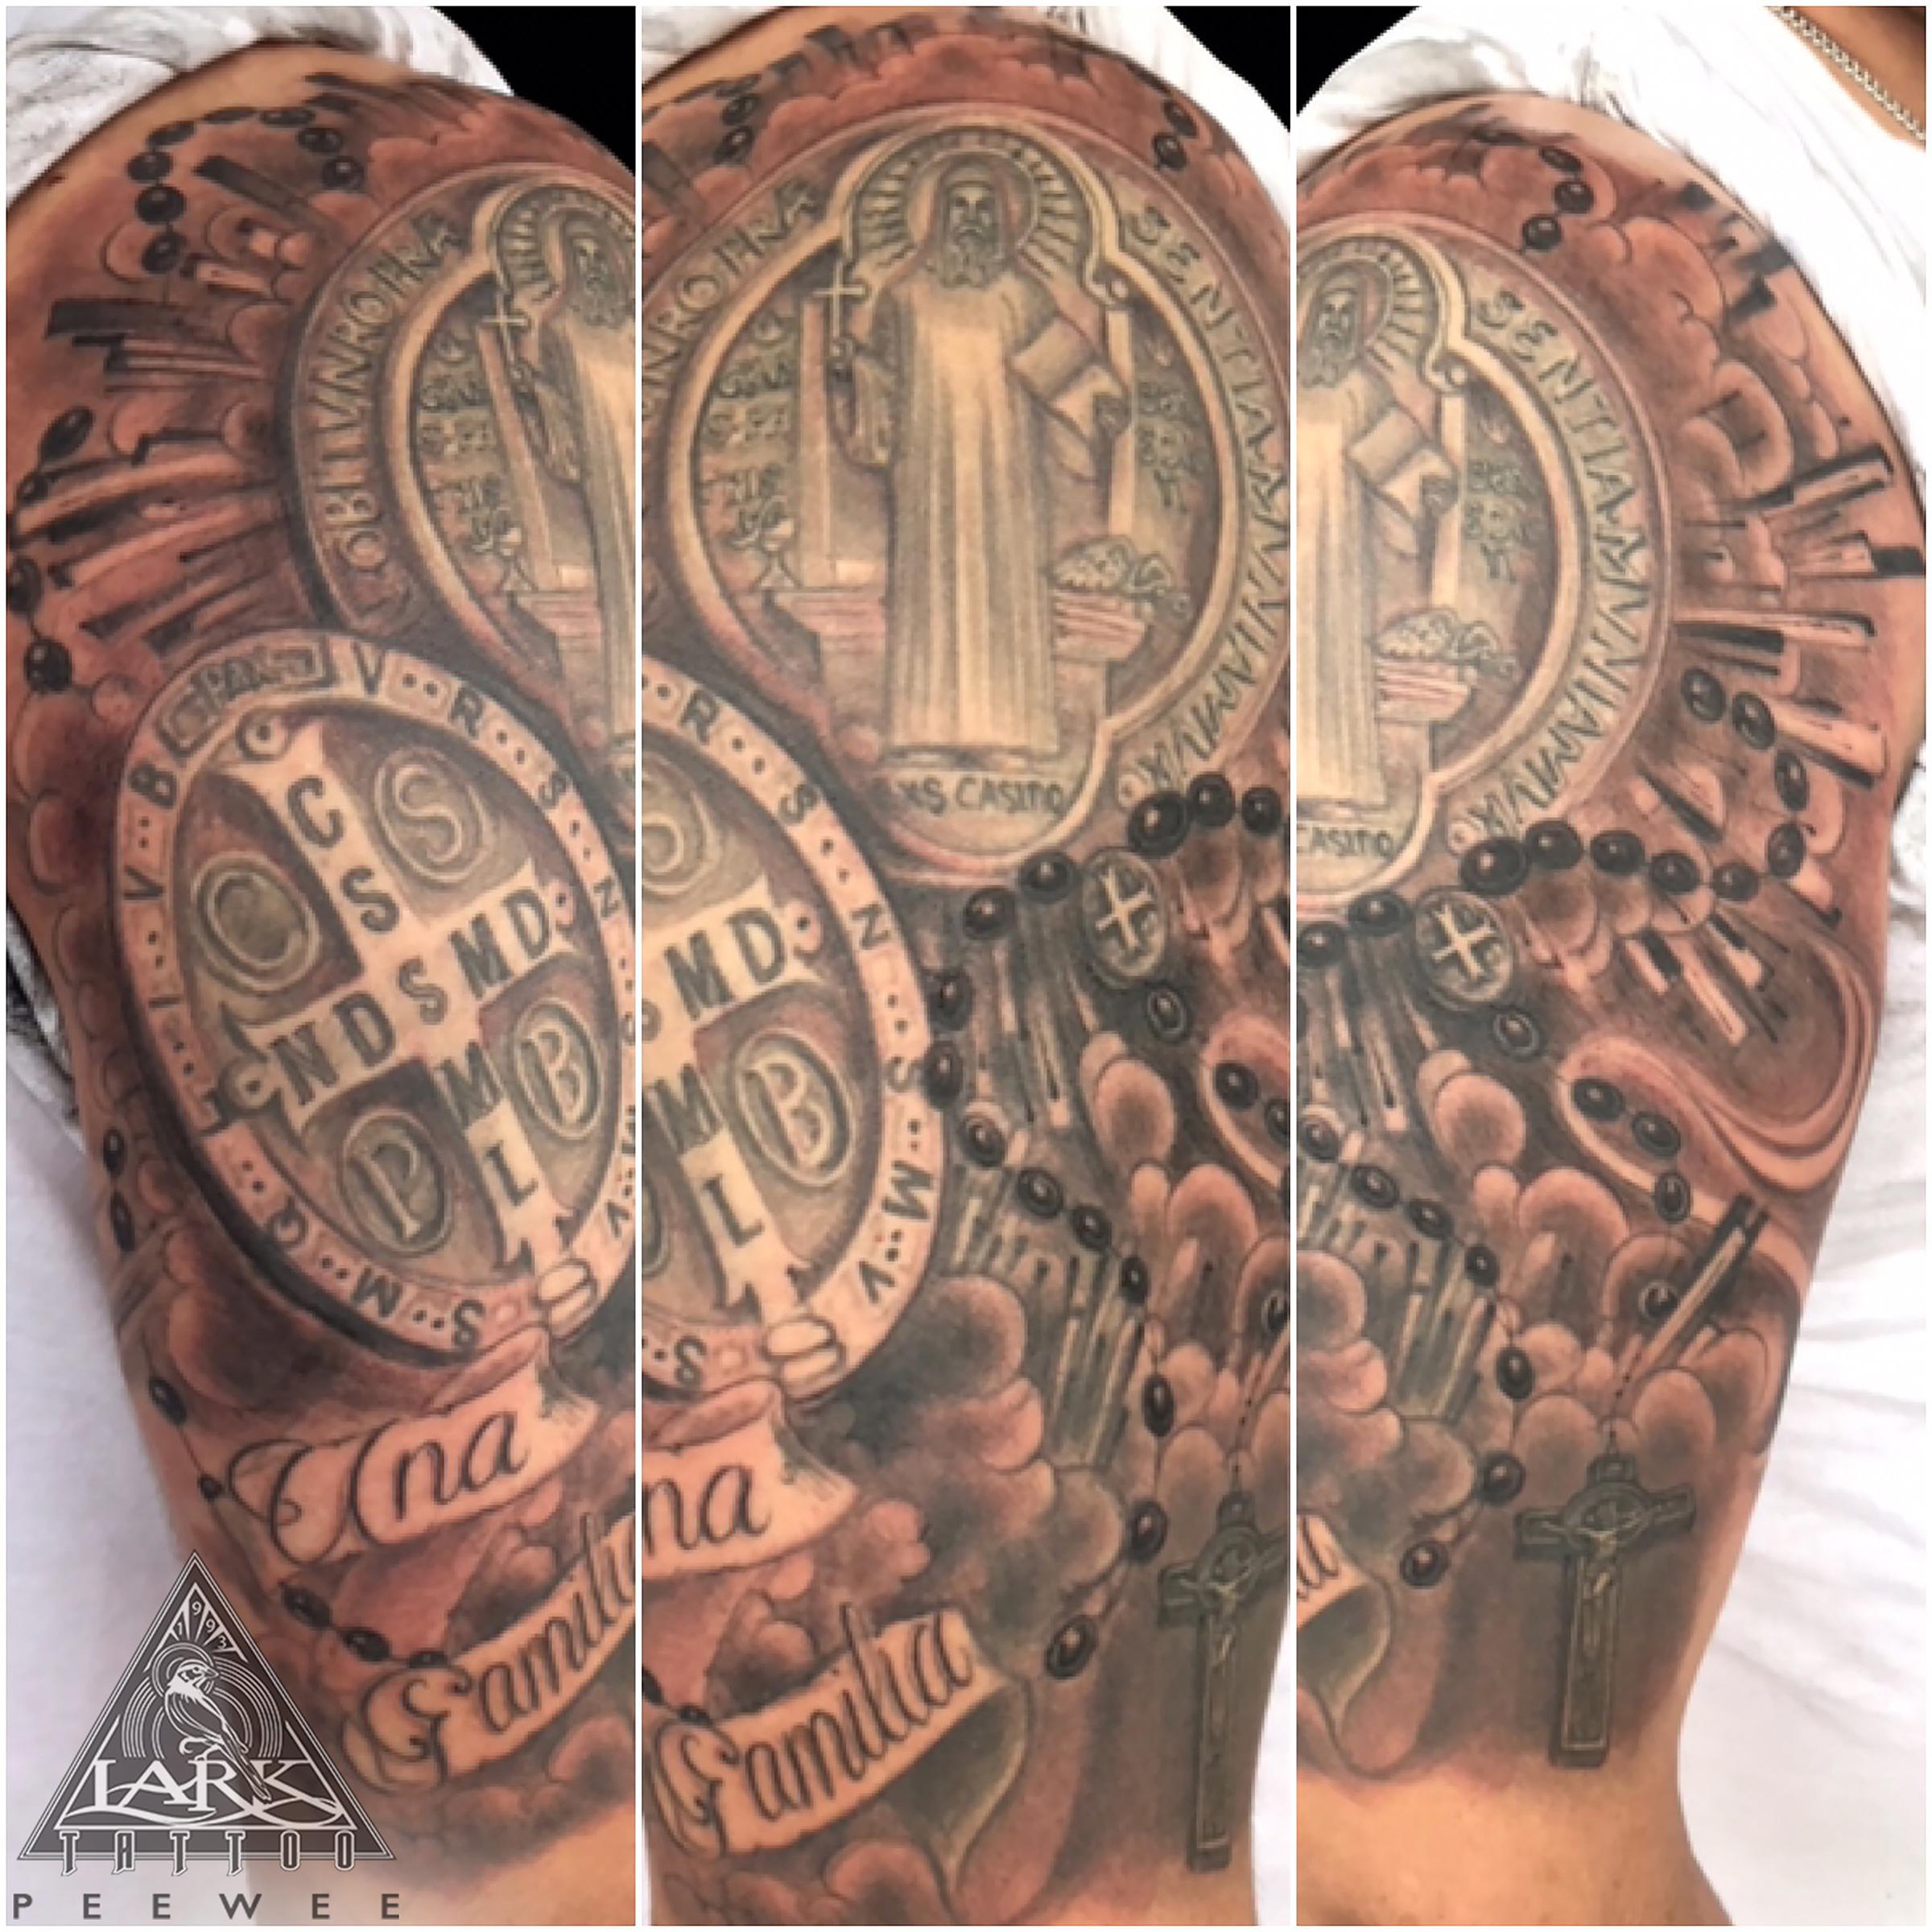 #bng #bngtattoo #blackandgraytattoo #blackandgreytattoo #religious #religioustattoo #rosary #rosarytattoo #halfsleeve #halfsleevetattoo #letteringtattoo #crosstattoo #tattoo #tattoos #tat #tats #tatts #tatted #tattedup #tattoist #tattooed #inked #inkedup #ink #tattoooftheday #amazingink #bodyart #larktattoo #larktattoos #larktattoowestbury #westbury #longisland #NY #NewYork #usa #art